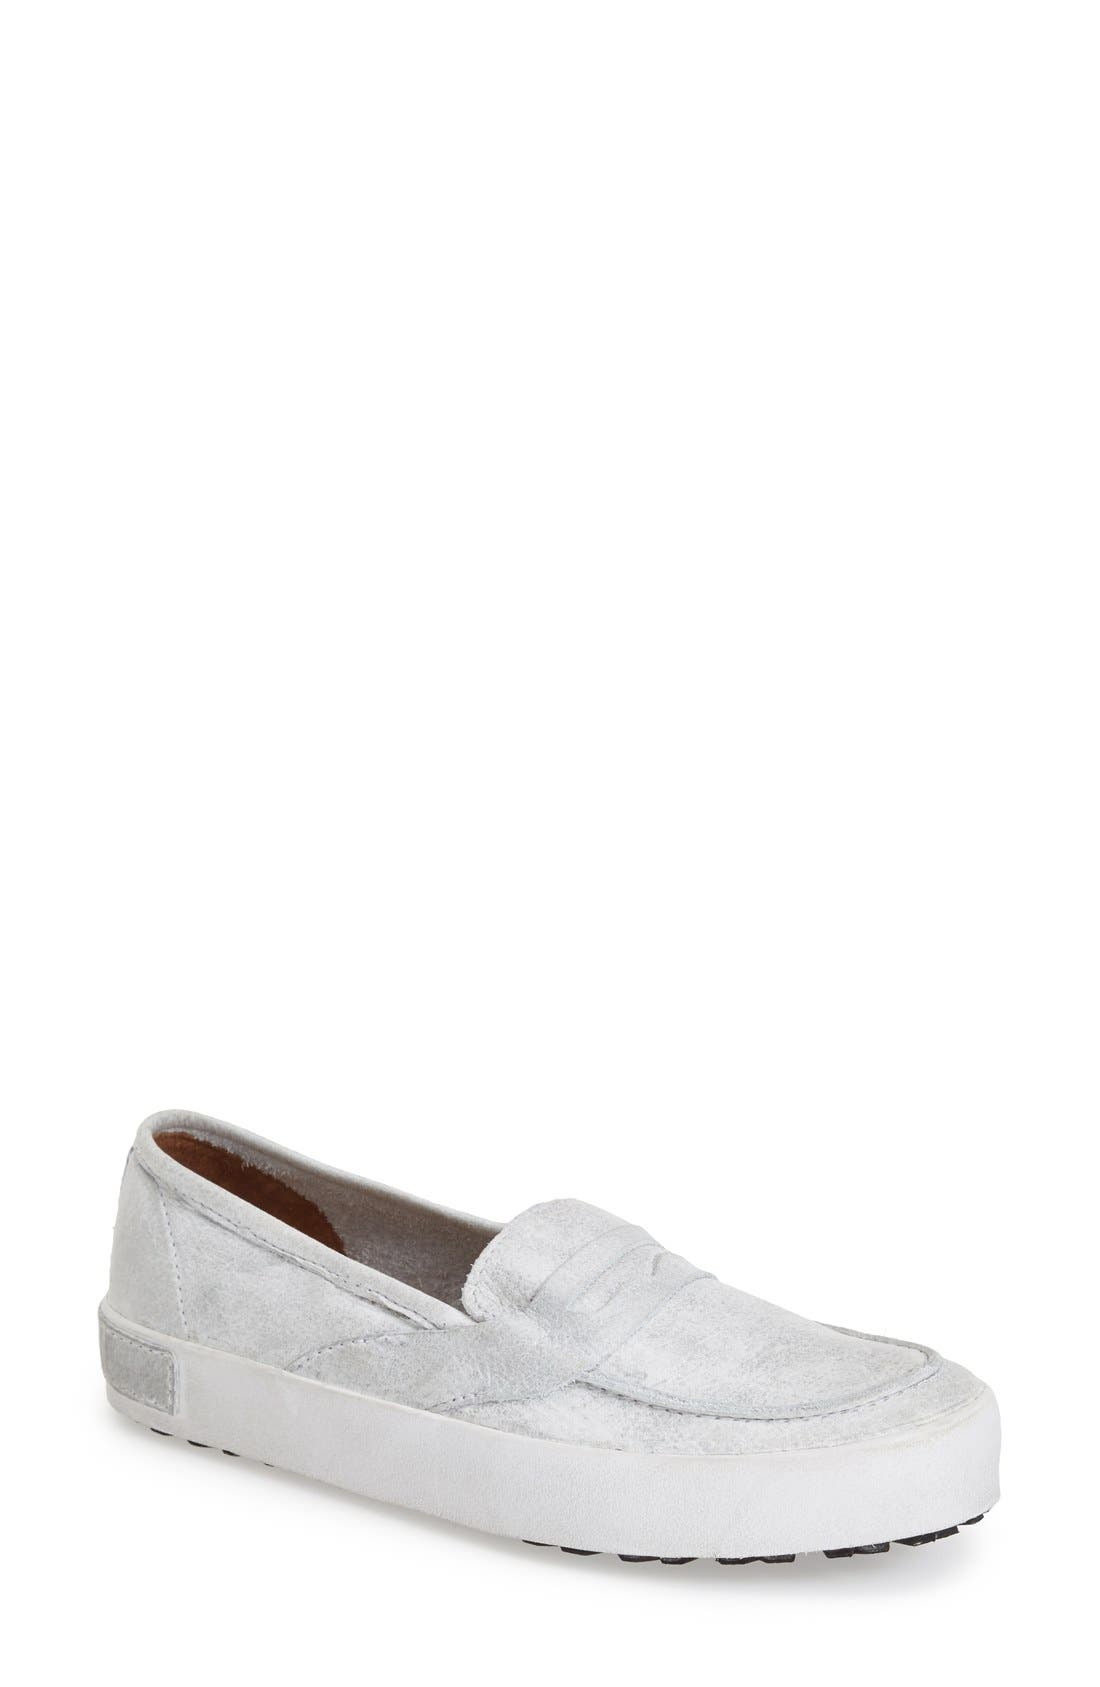 'JL23' Slip-On Sneaker,                             Main thumbnail 3, color,